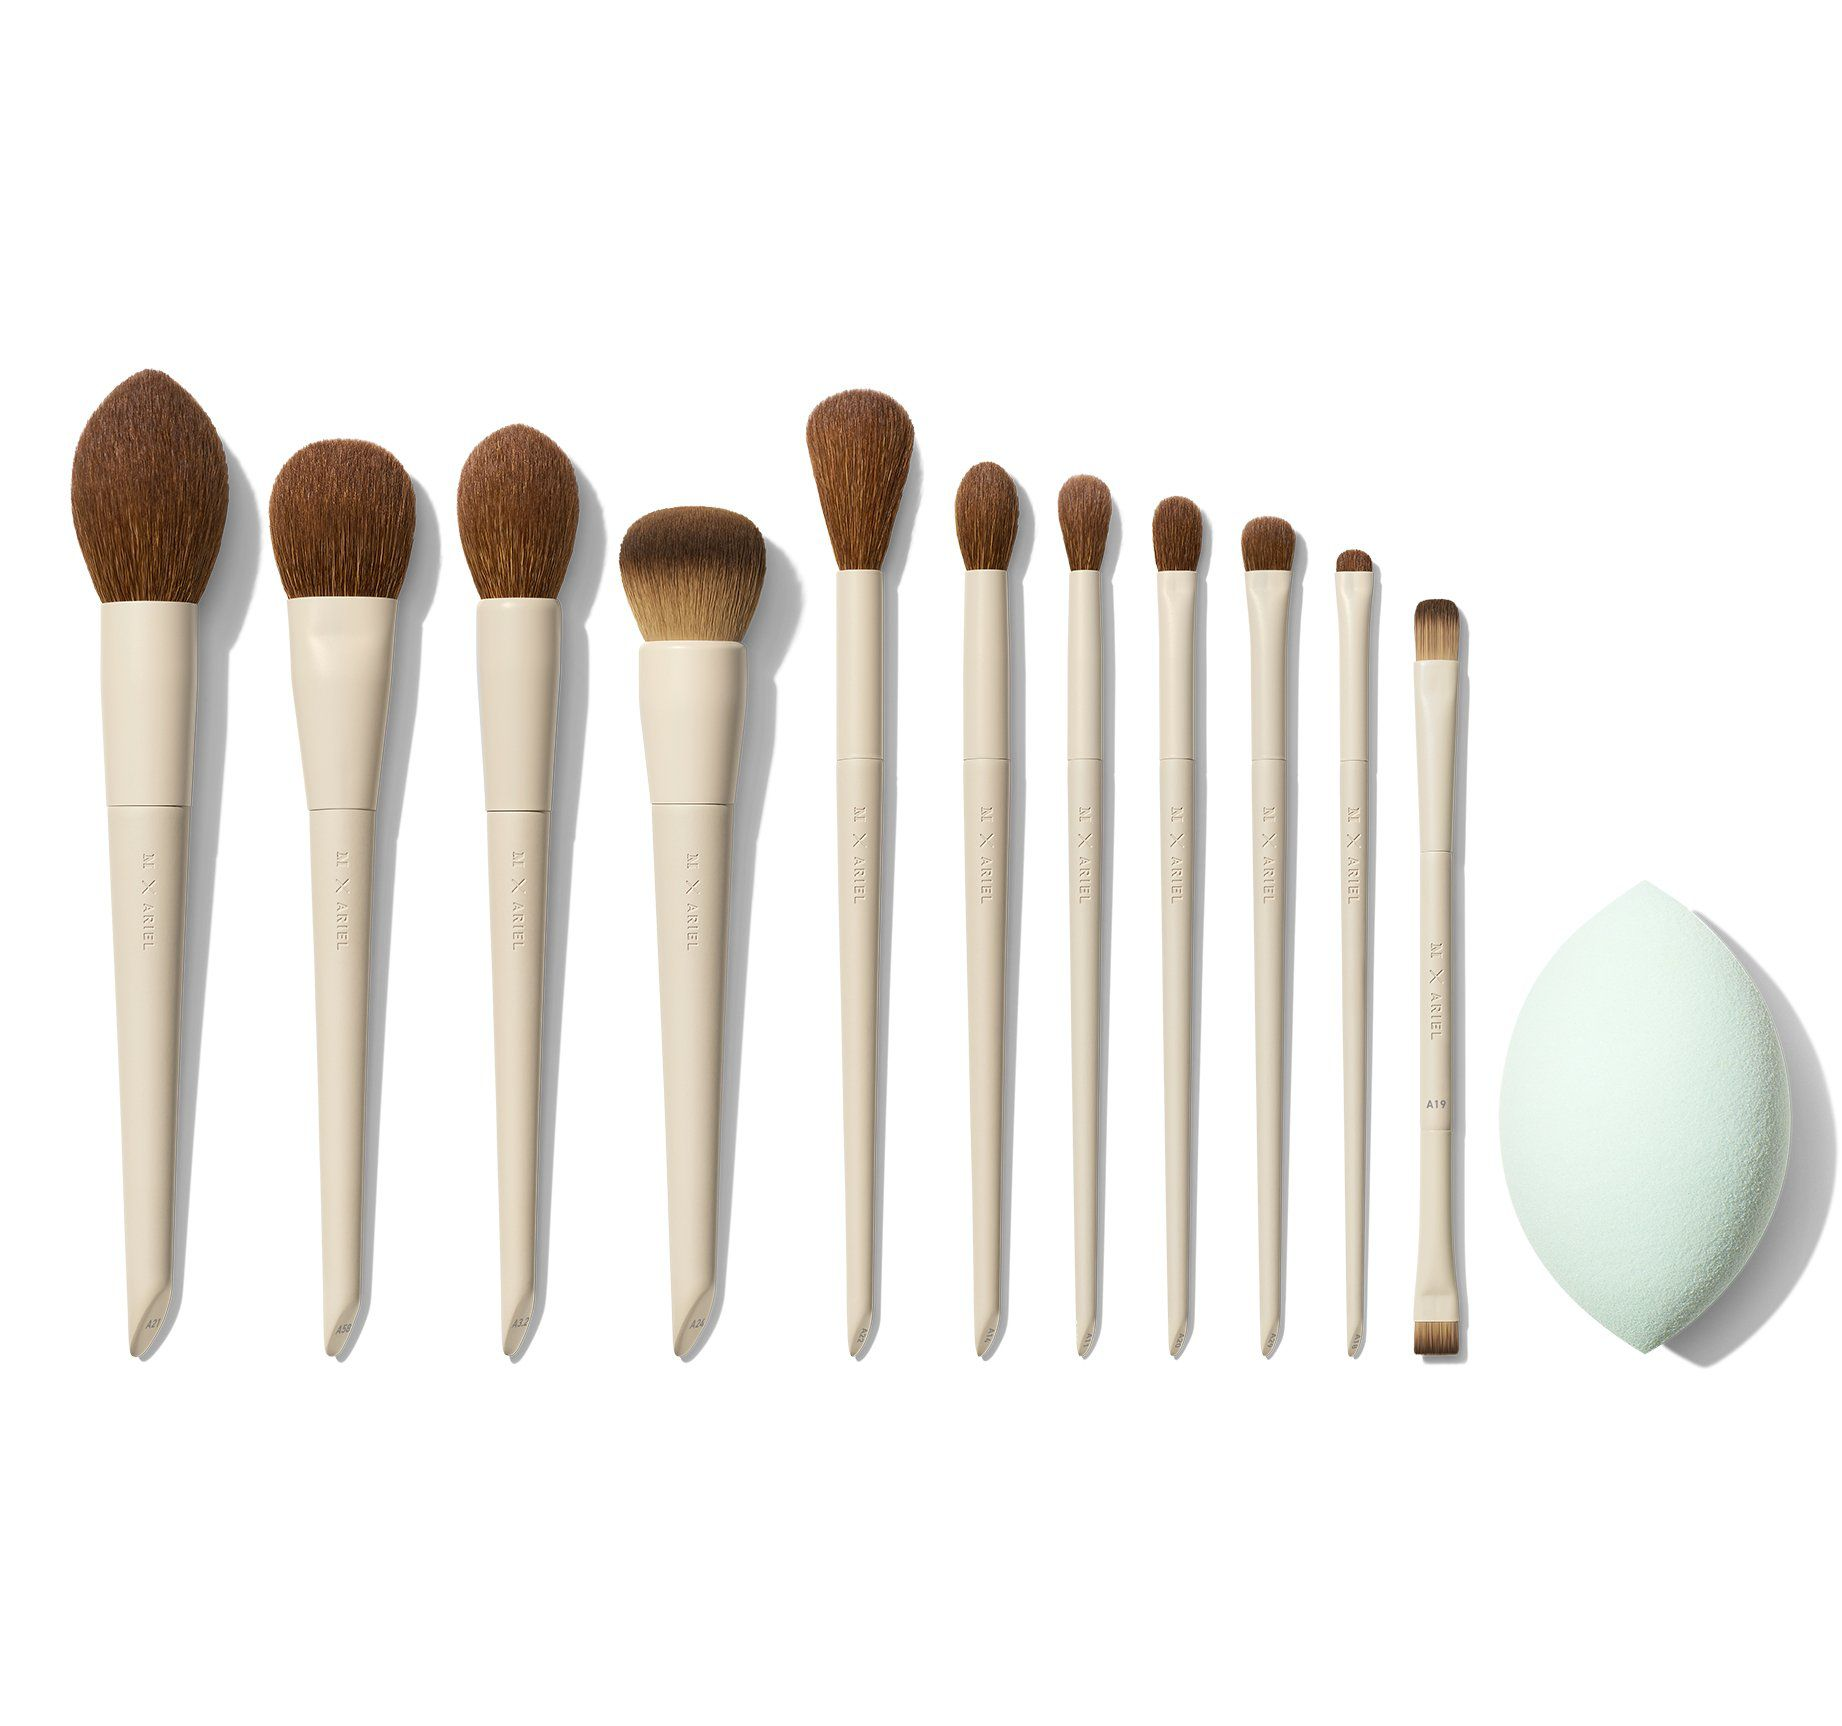 Morphe x Ariel 12-Piece Brush Set